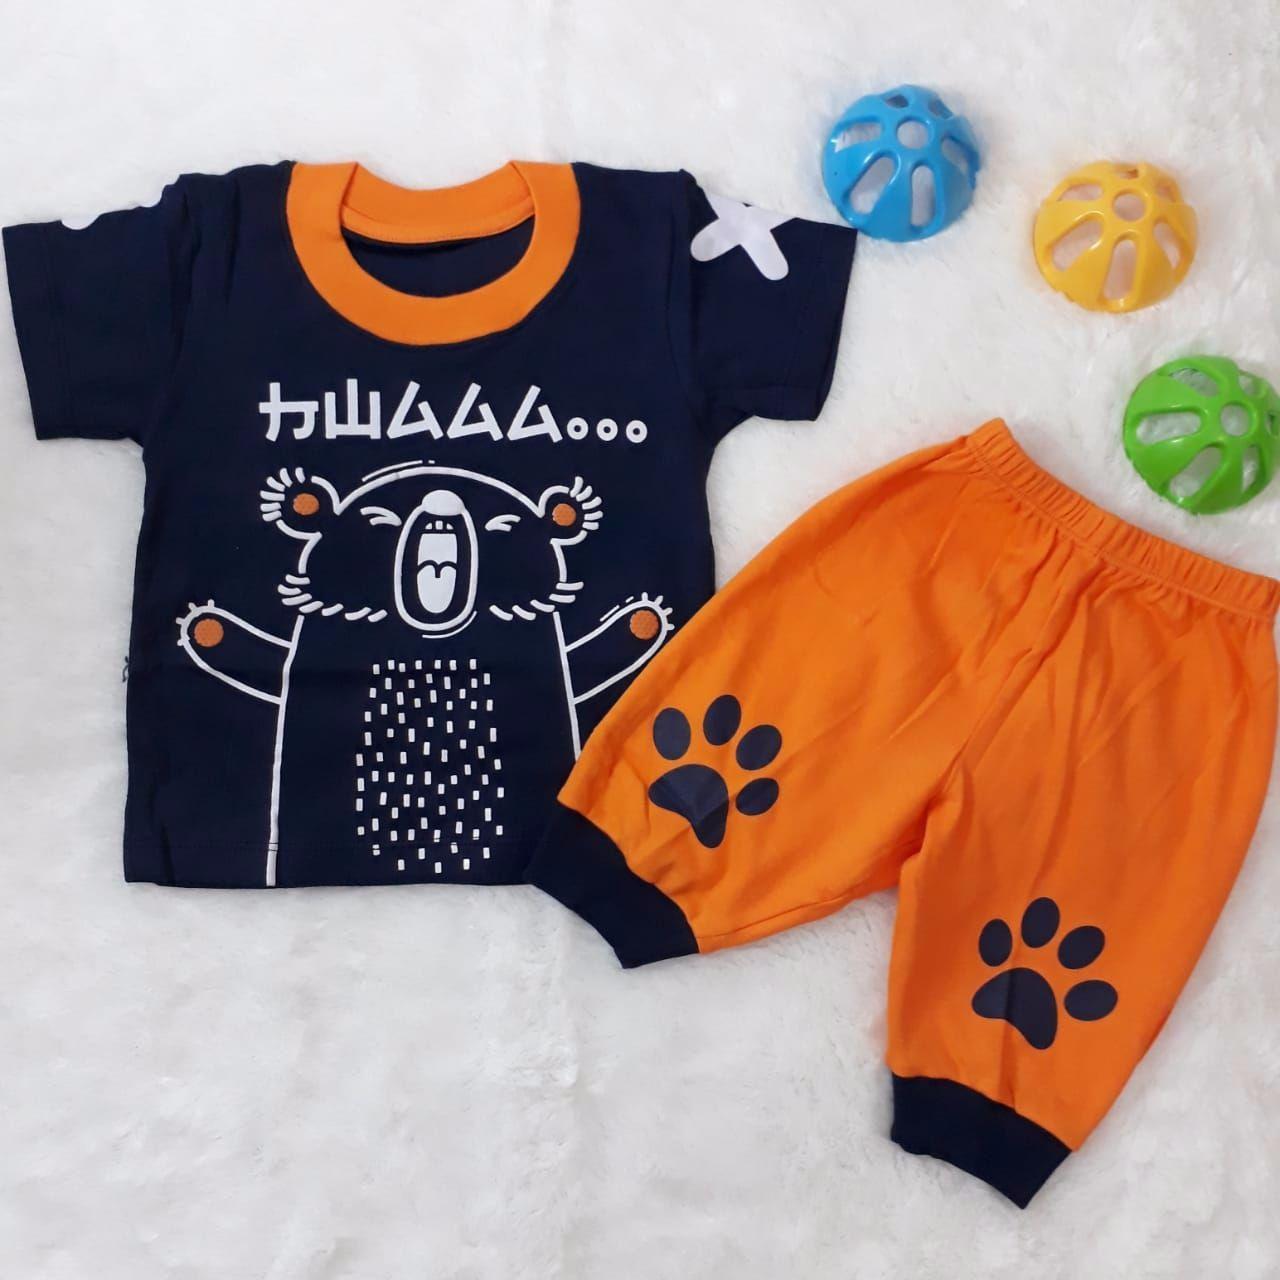 Baju setelan anak laki laki umur 3bulan sampai 3 tahun/Baju atasan anak laki laki